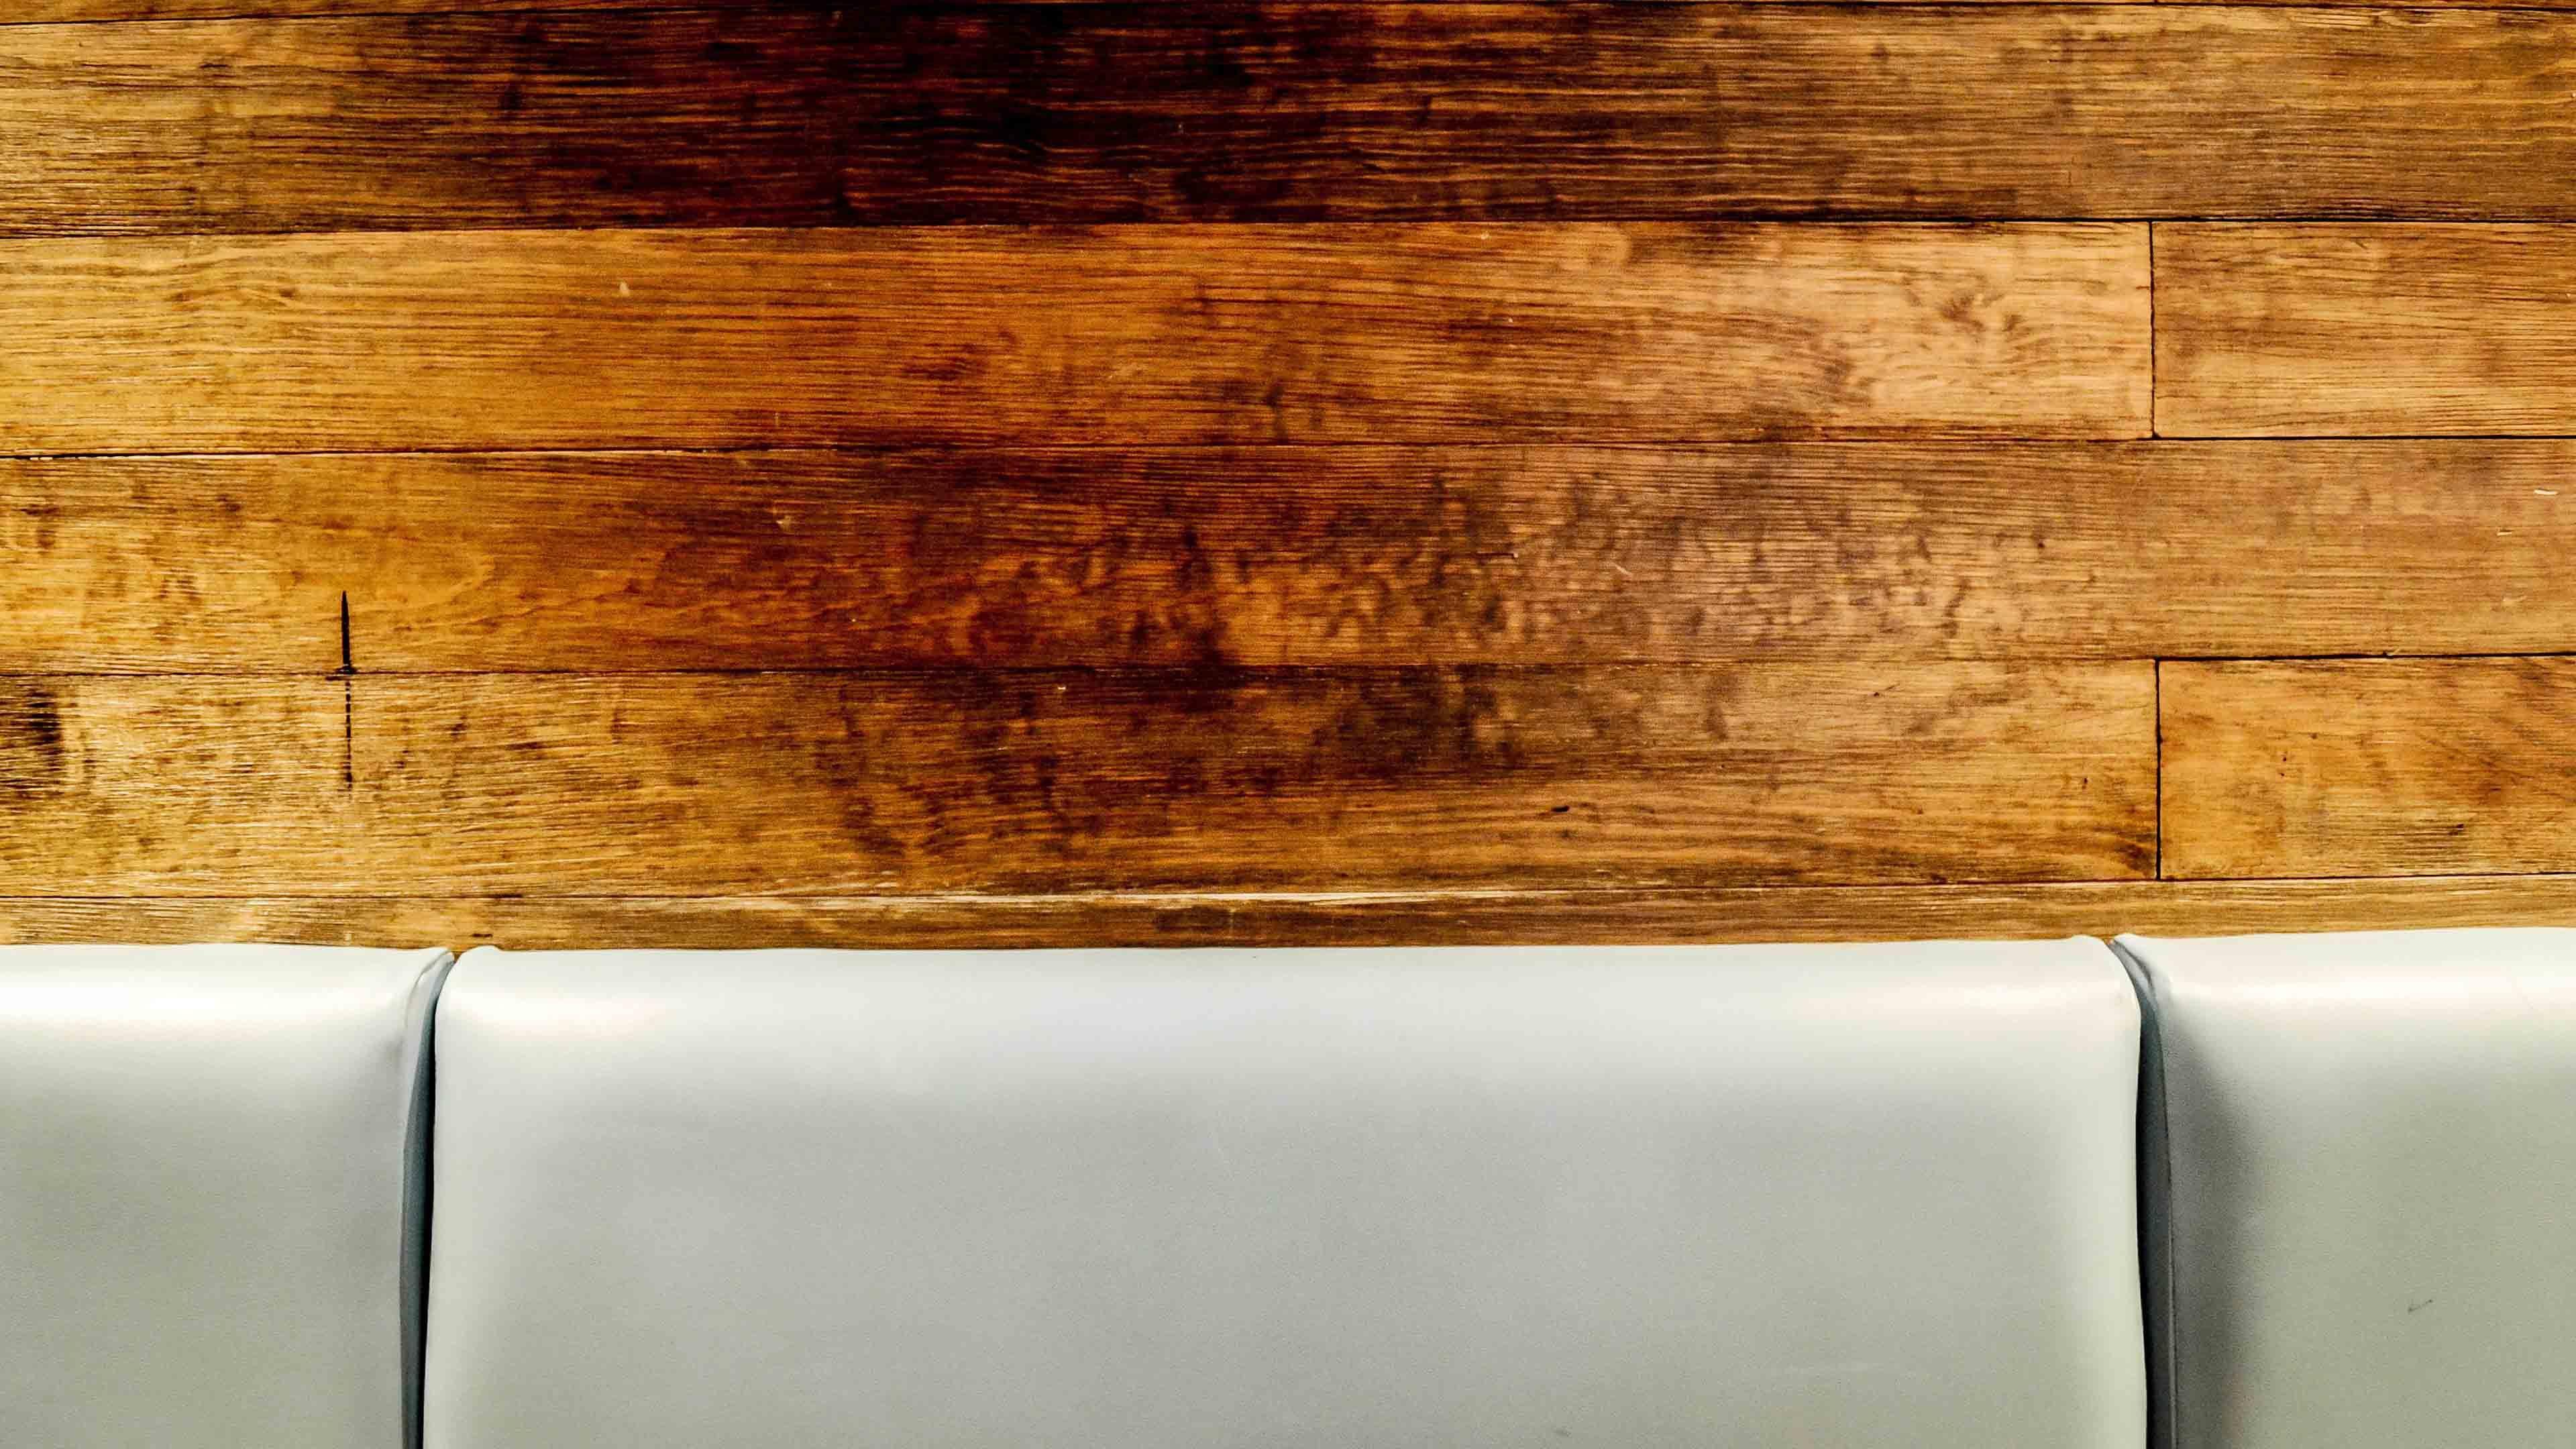 Wallpaper That Looks Like Barn Wood Barn Wood Wood Wallpaper Wood